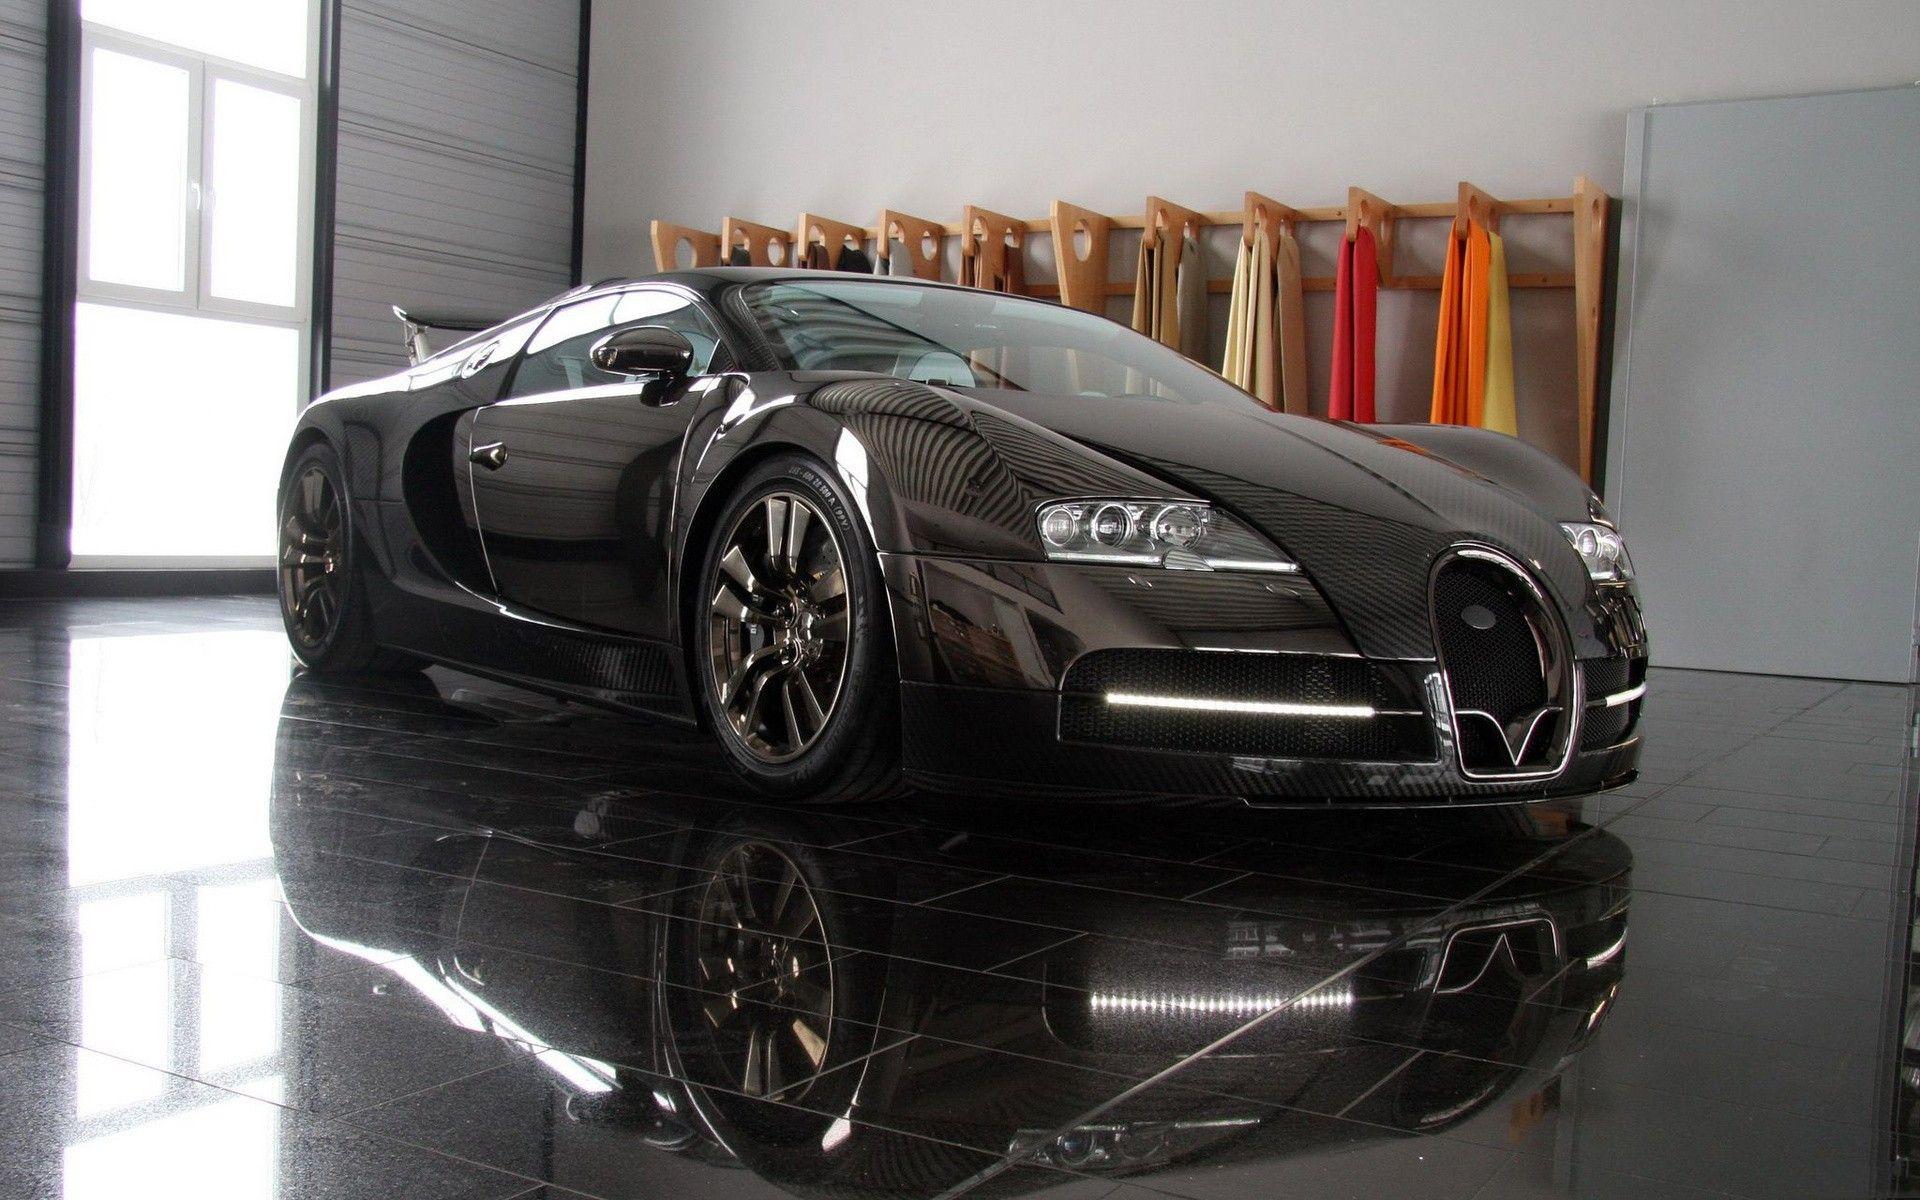 1e5cf0c968498349958429249d71a7ec Inspiring Bugatti Veyron Quarter Mile Speed Cars Trend